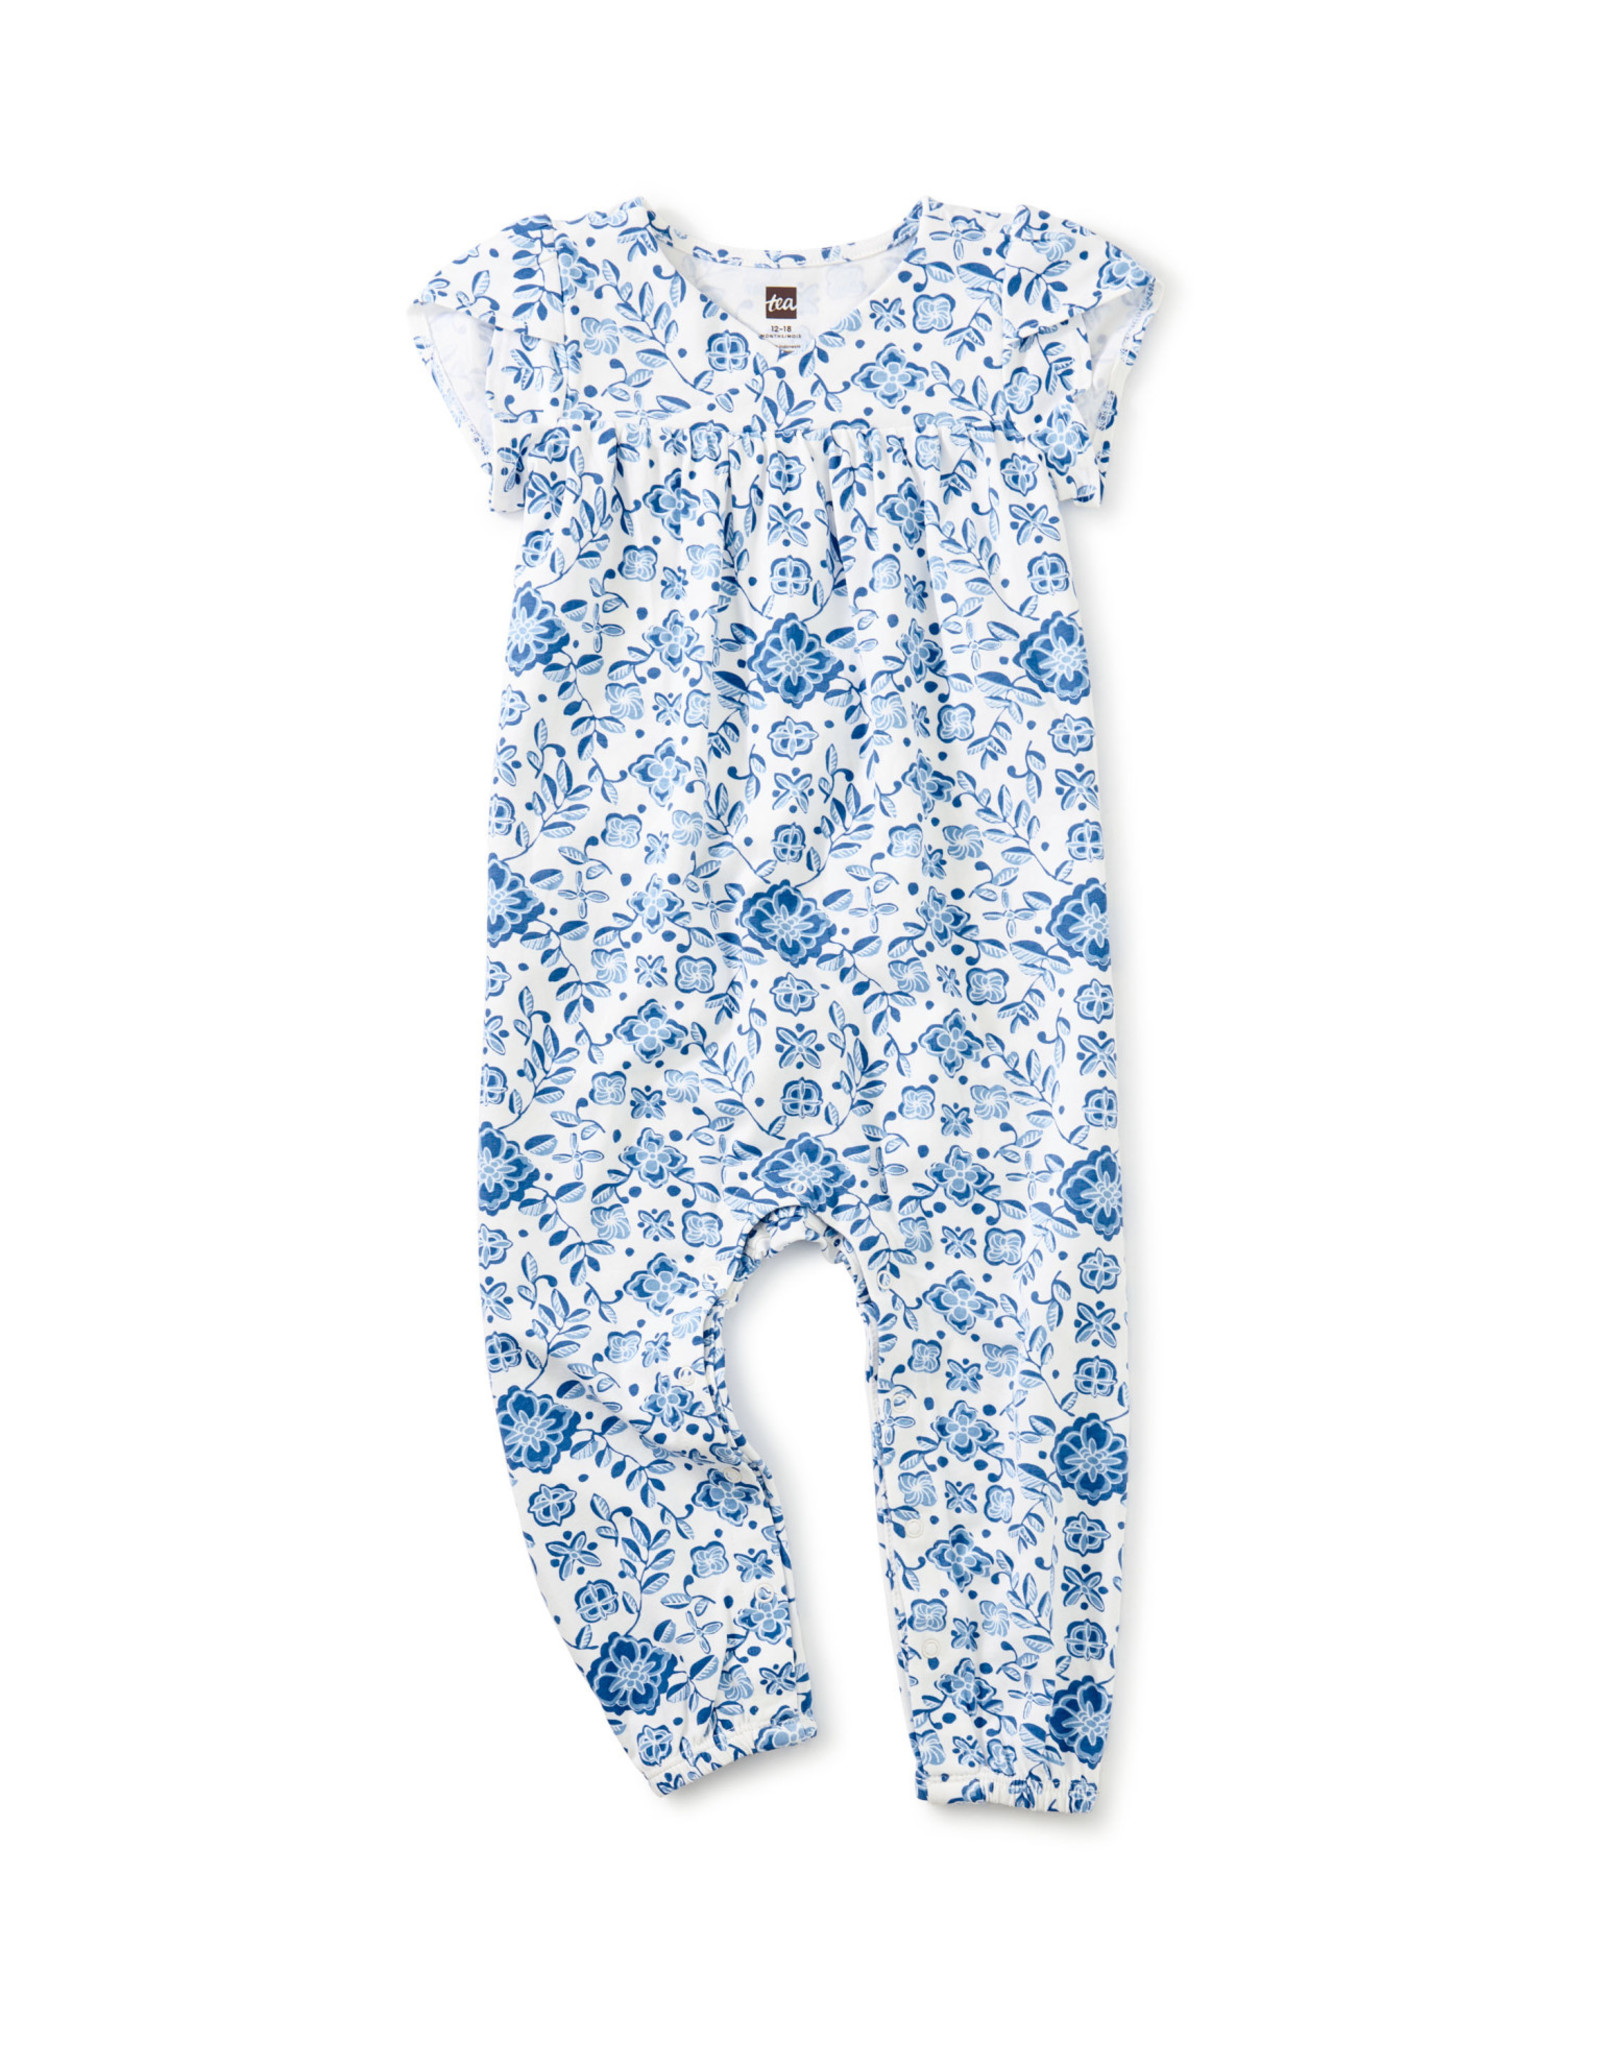 Tea Tulip Sleeve Wrap Baby Romper, Floral Azulejos